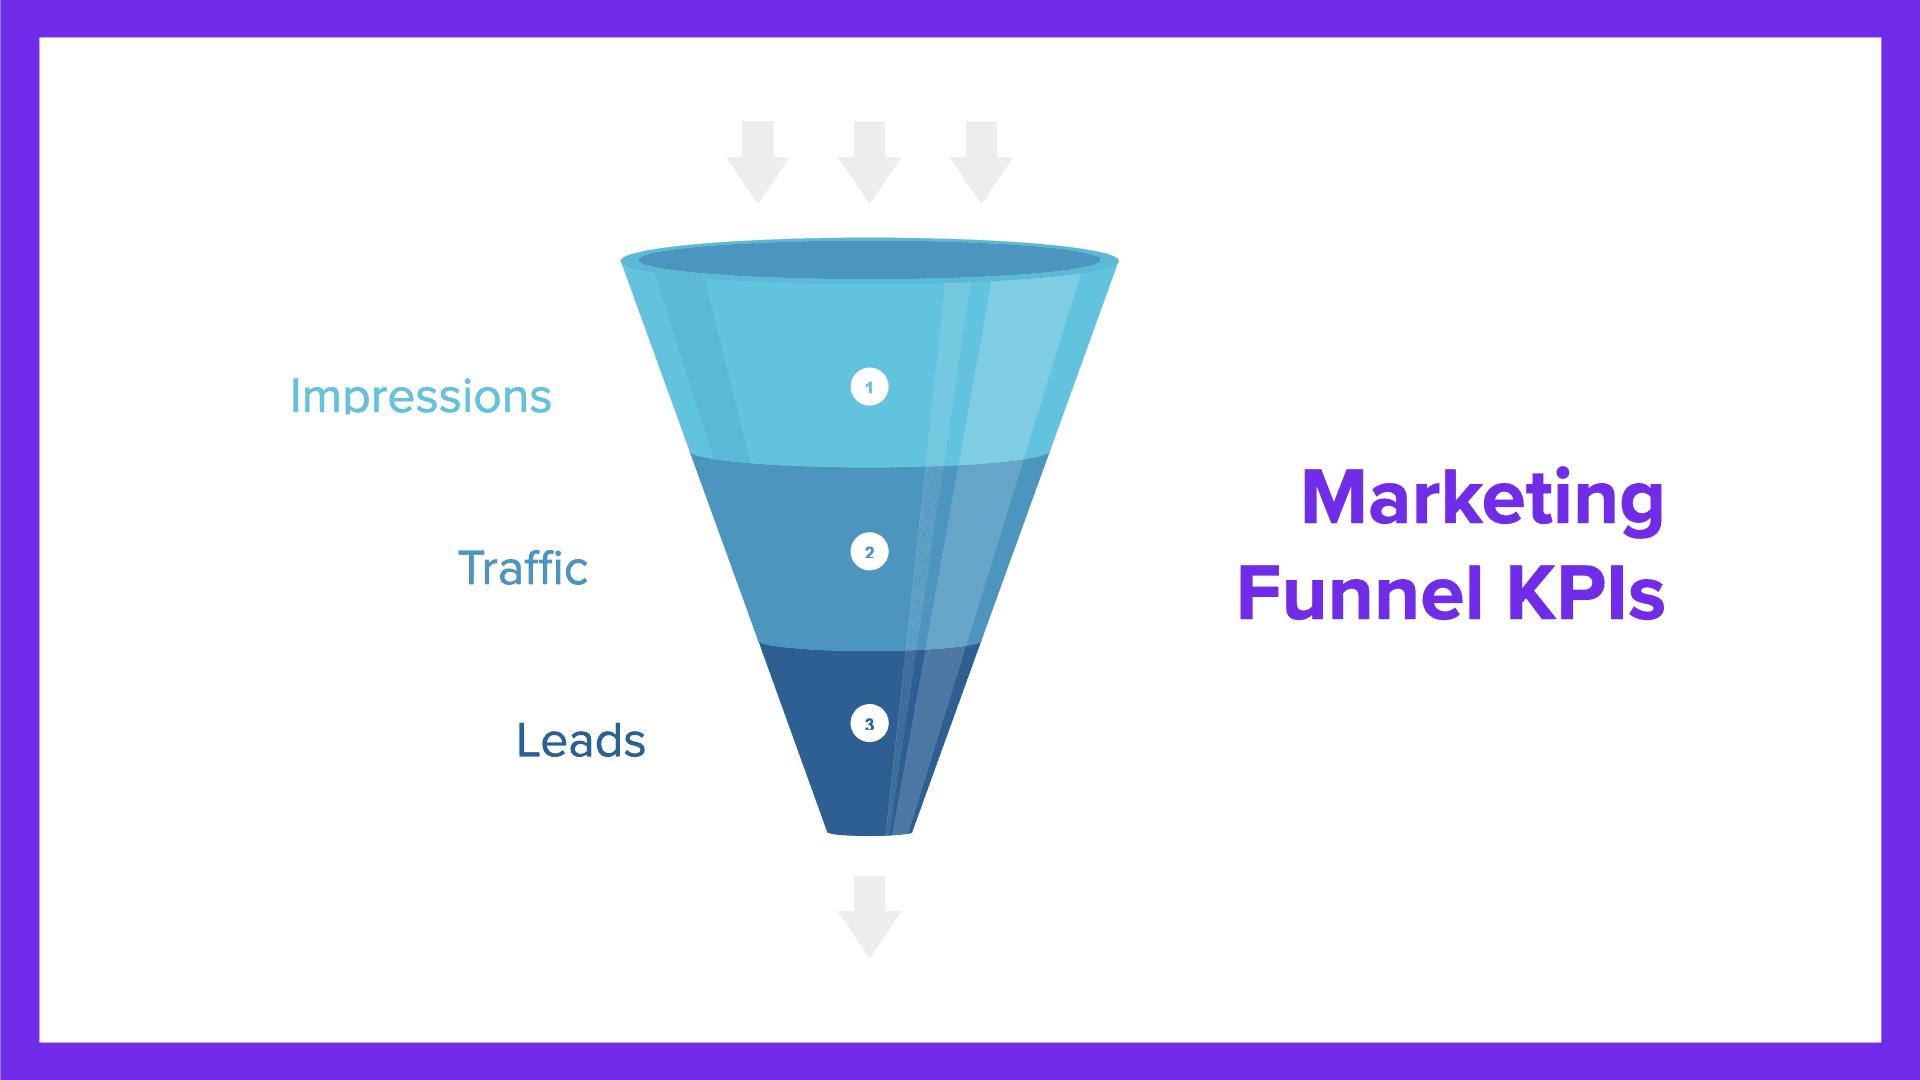 marketing funnel kpis